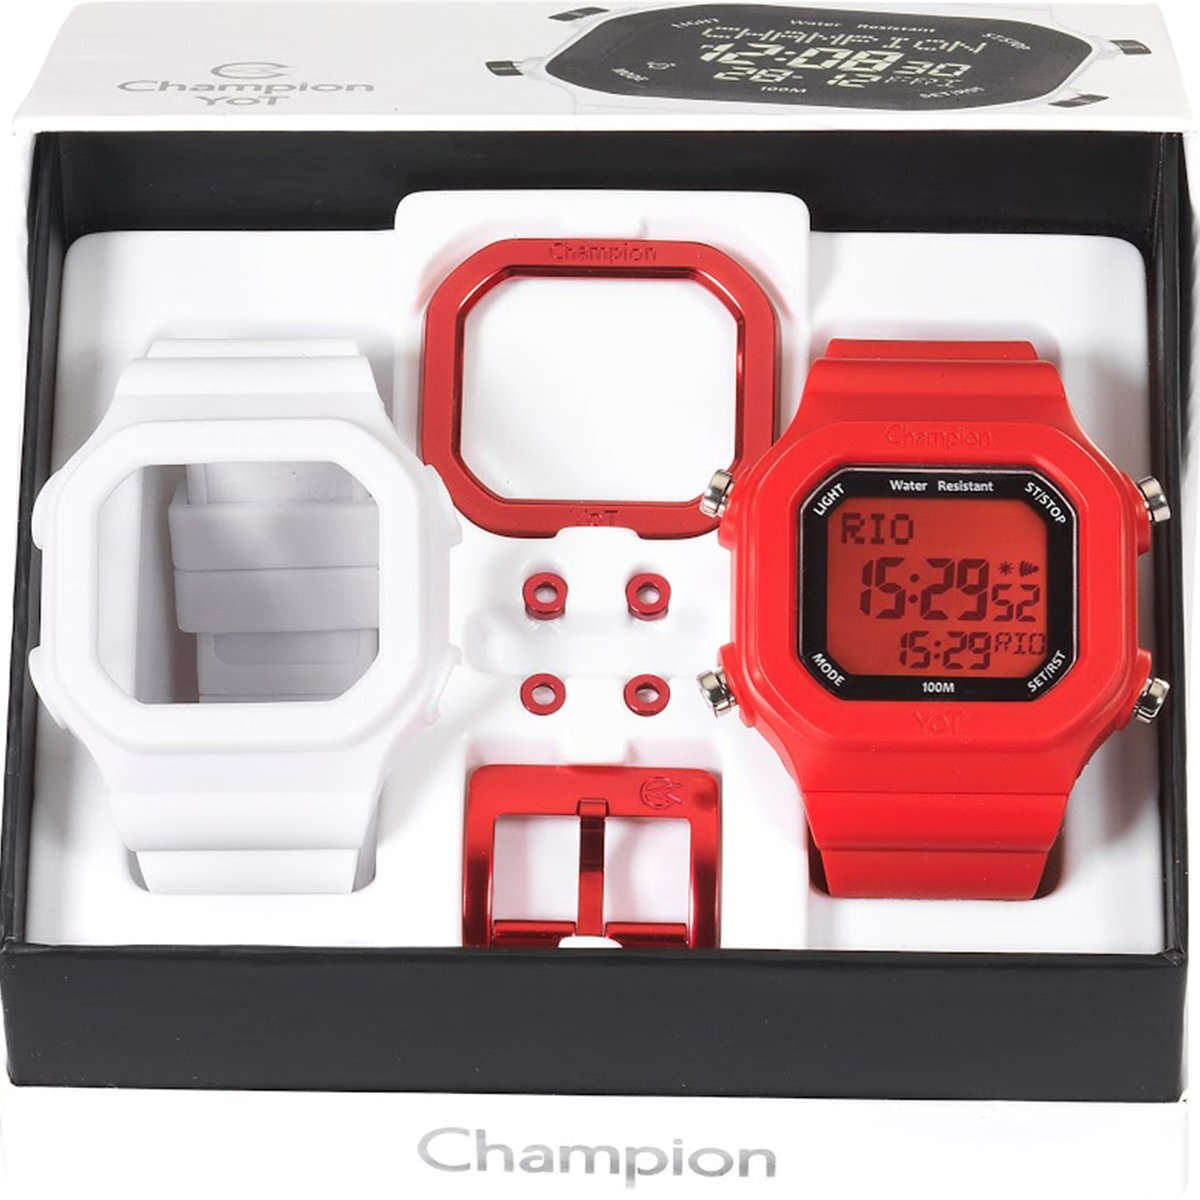 573f76f81f3 Relógio champion yot pulseiras e acessórios compre agora netshoes jpg  544x544 Relogio champion yot